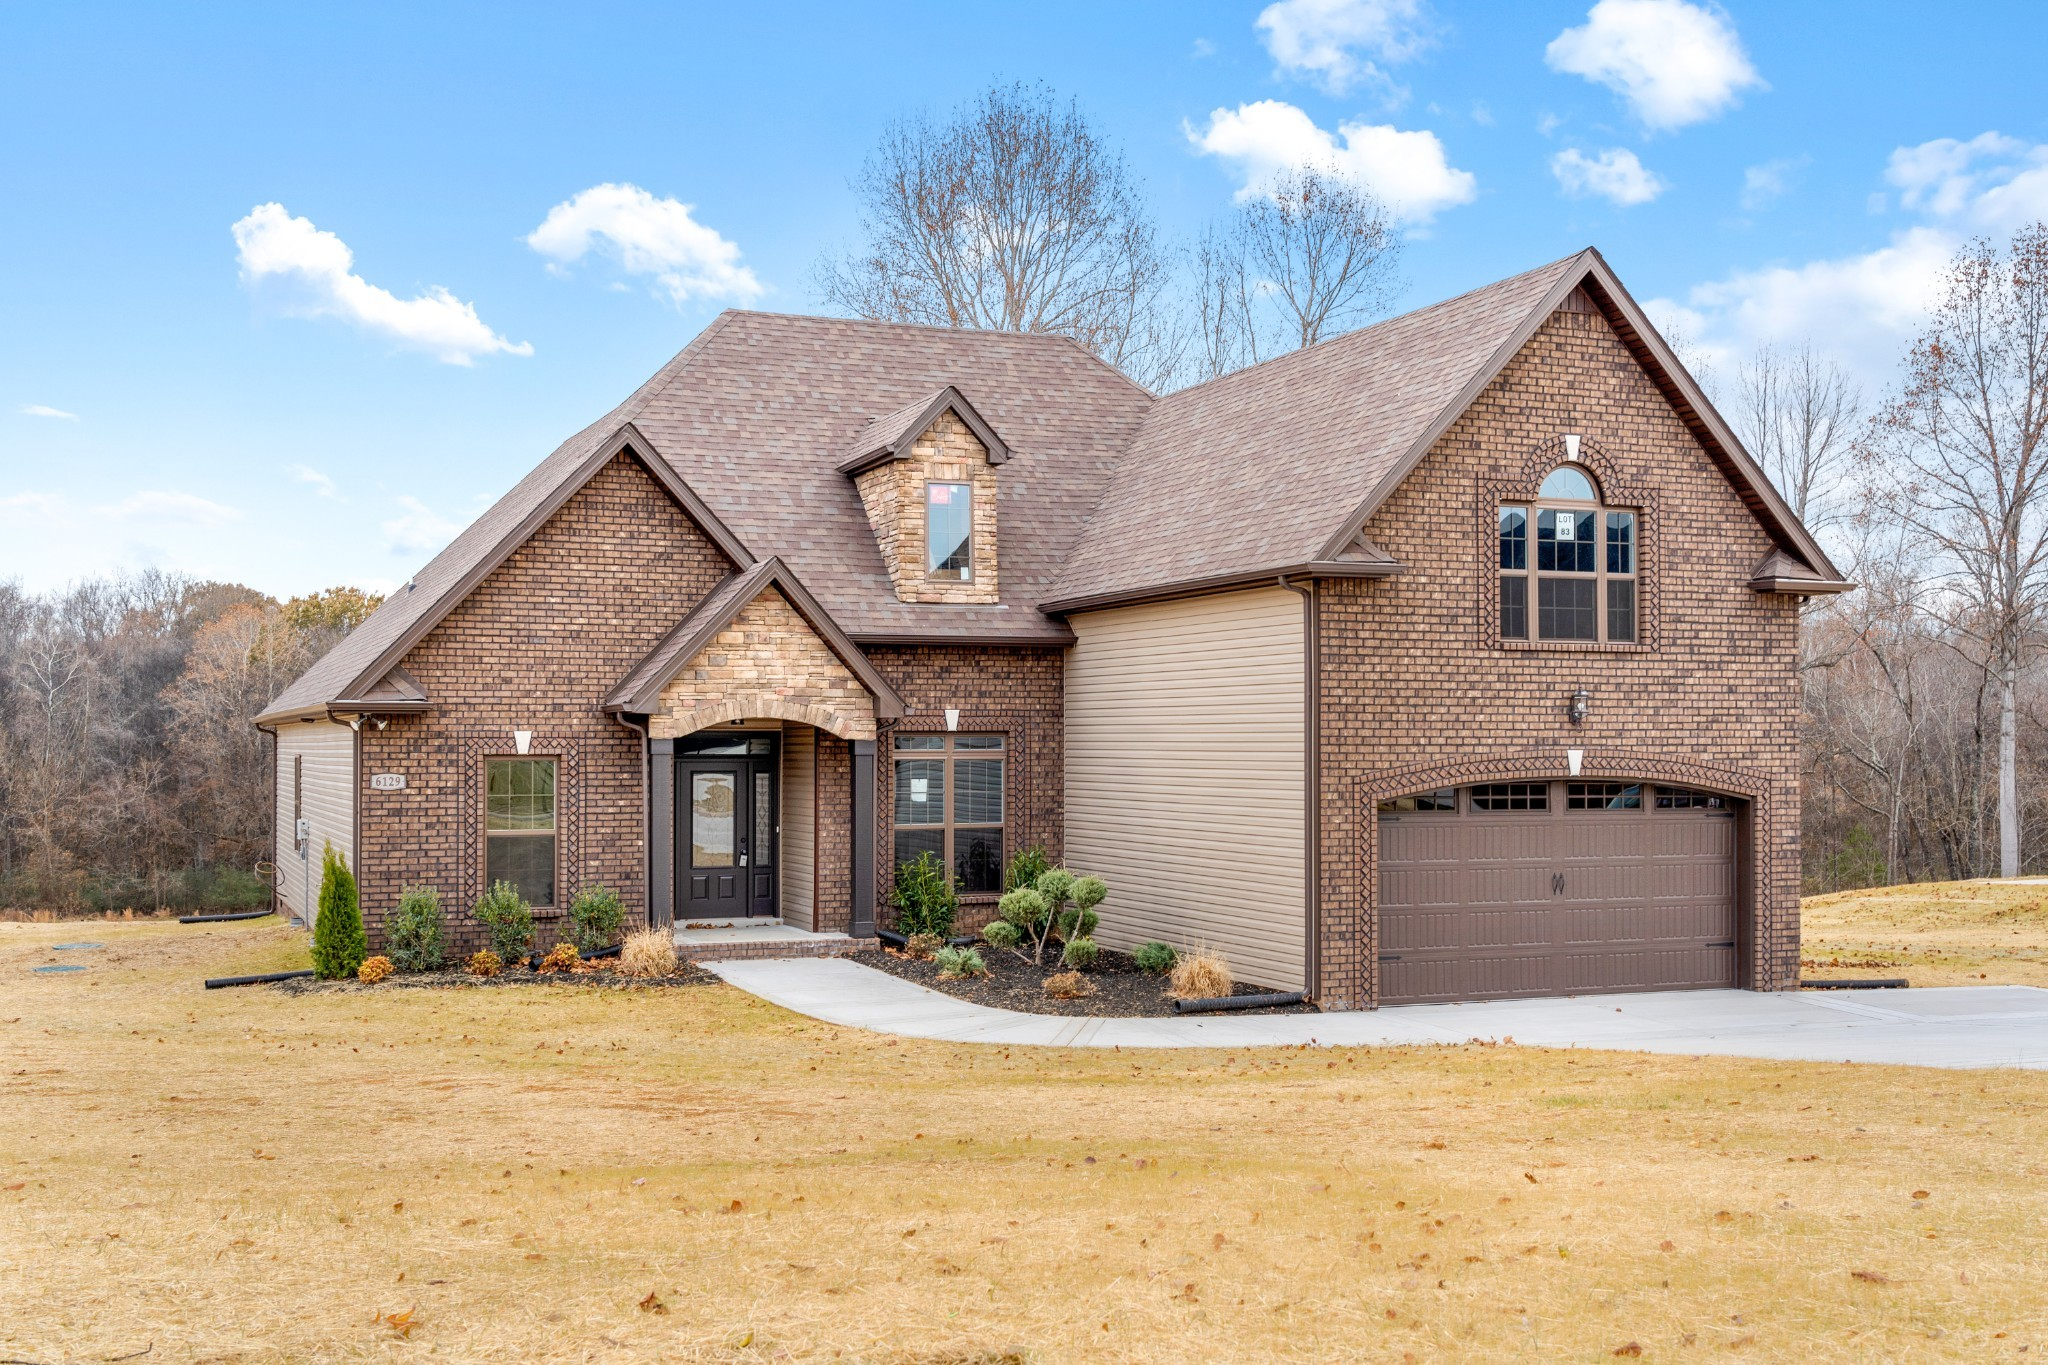 54 Meadowland, Adams, TN 37010 - Adams, TN real estate listing